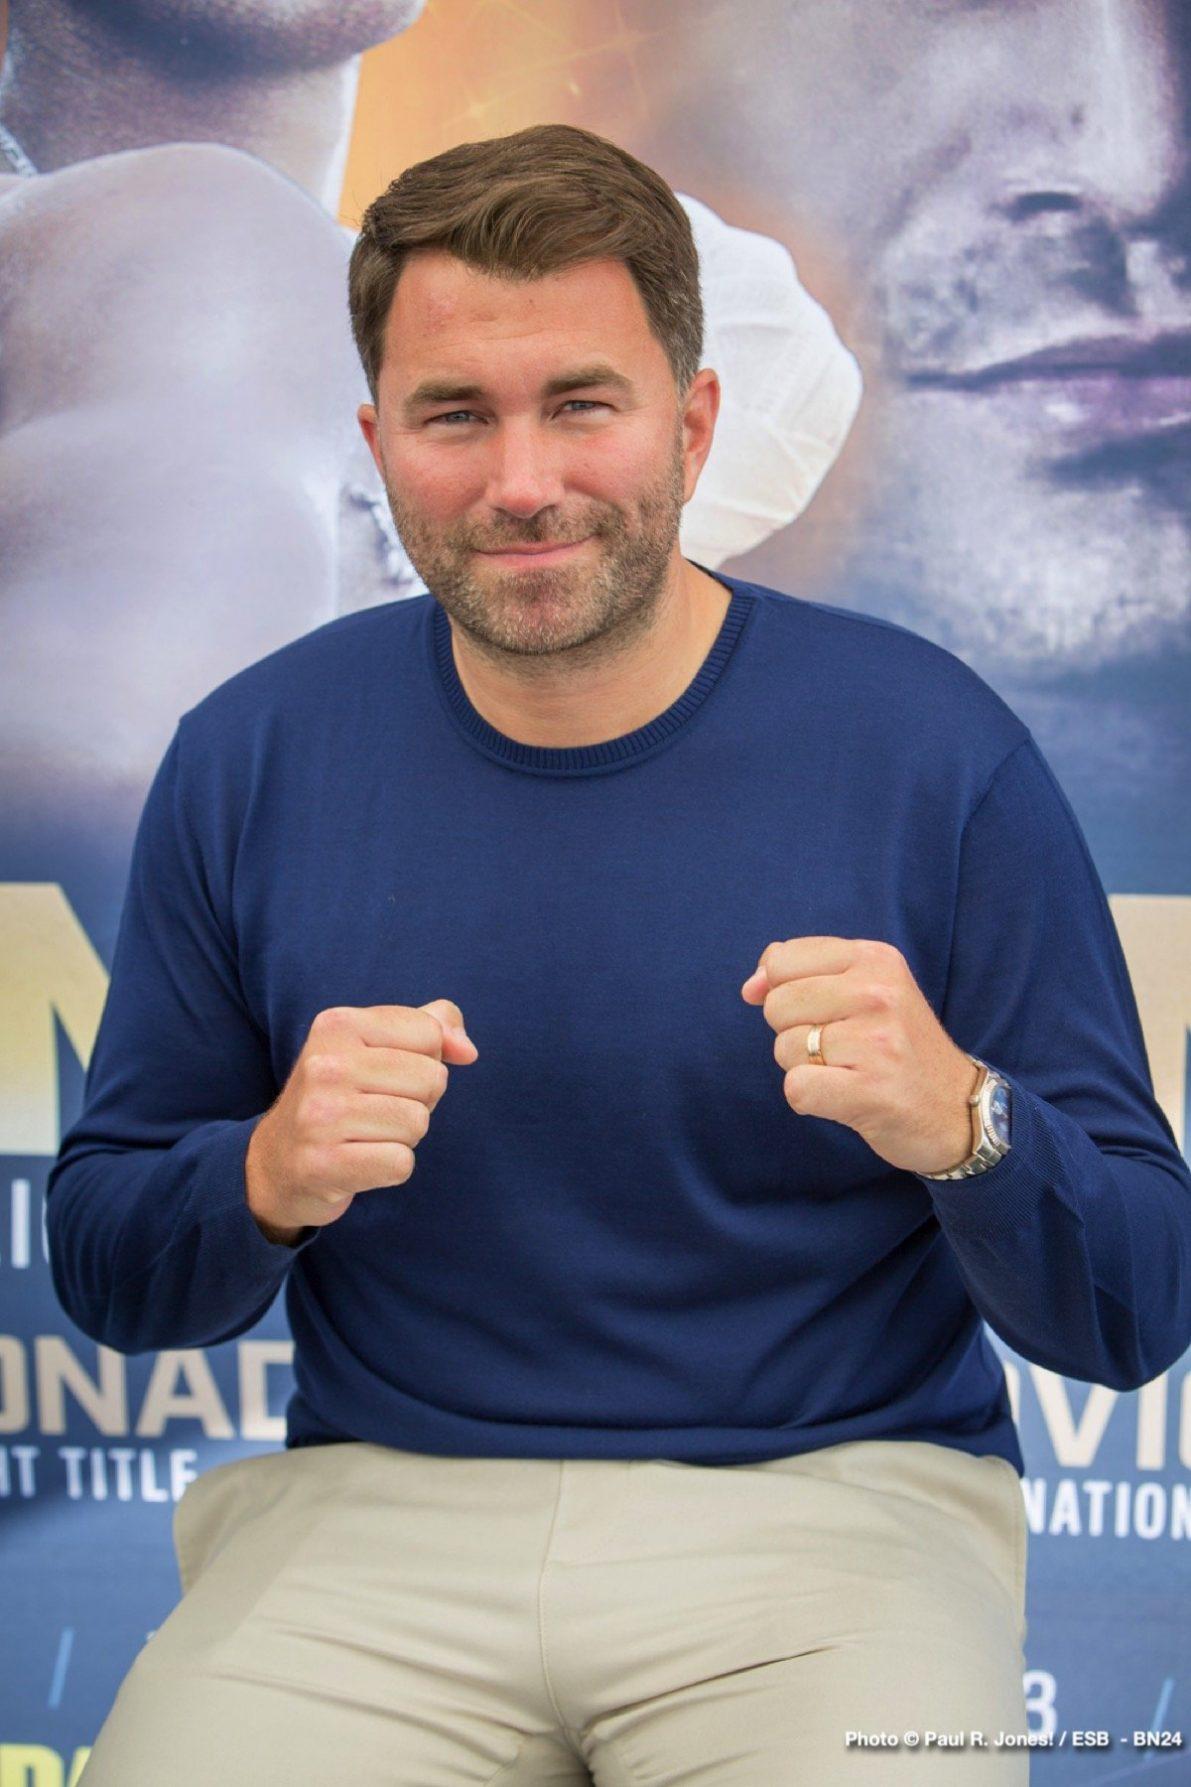 Devin Haney Boxing News